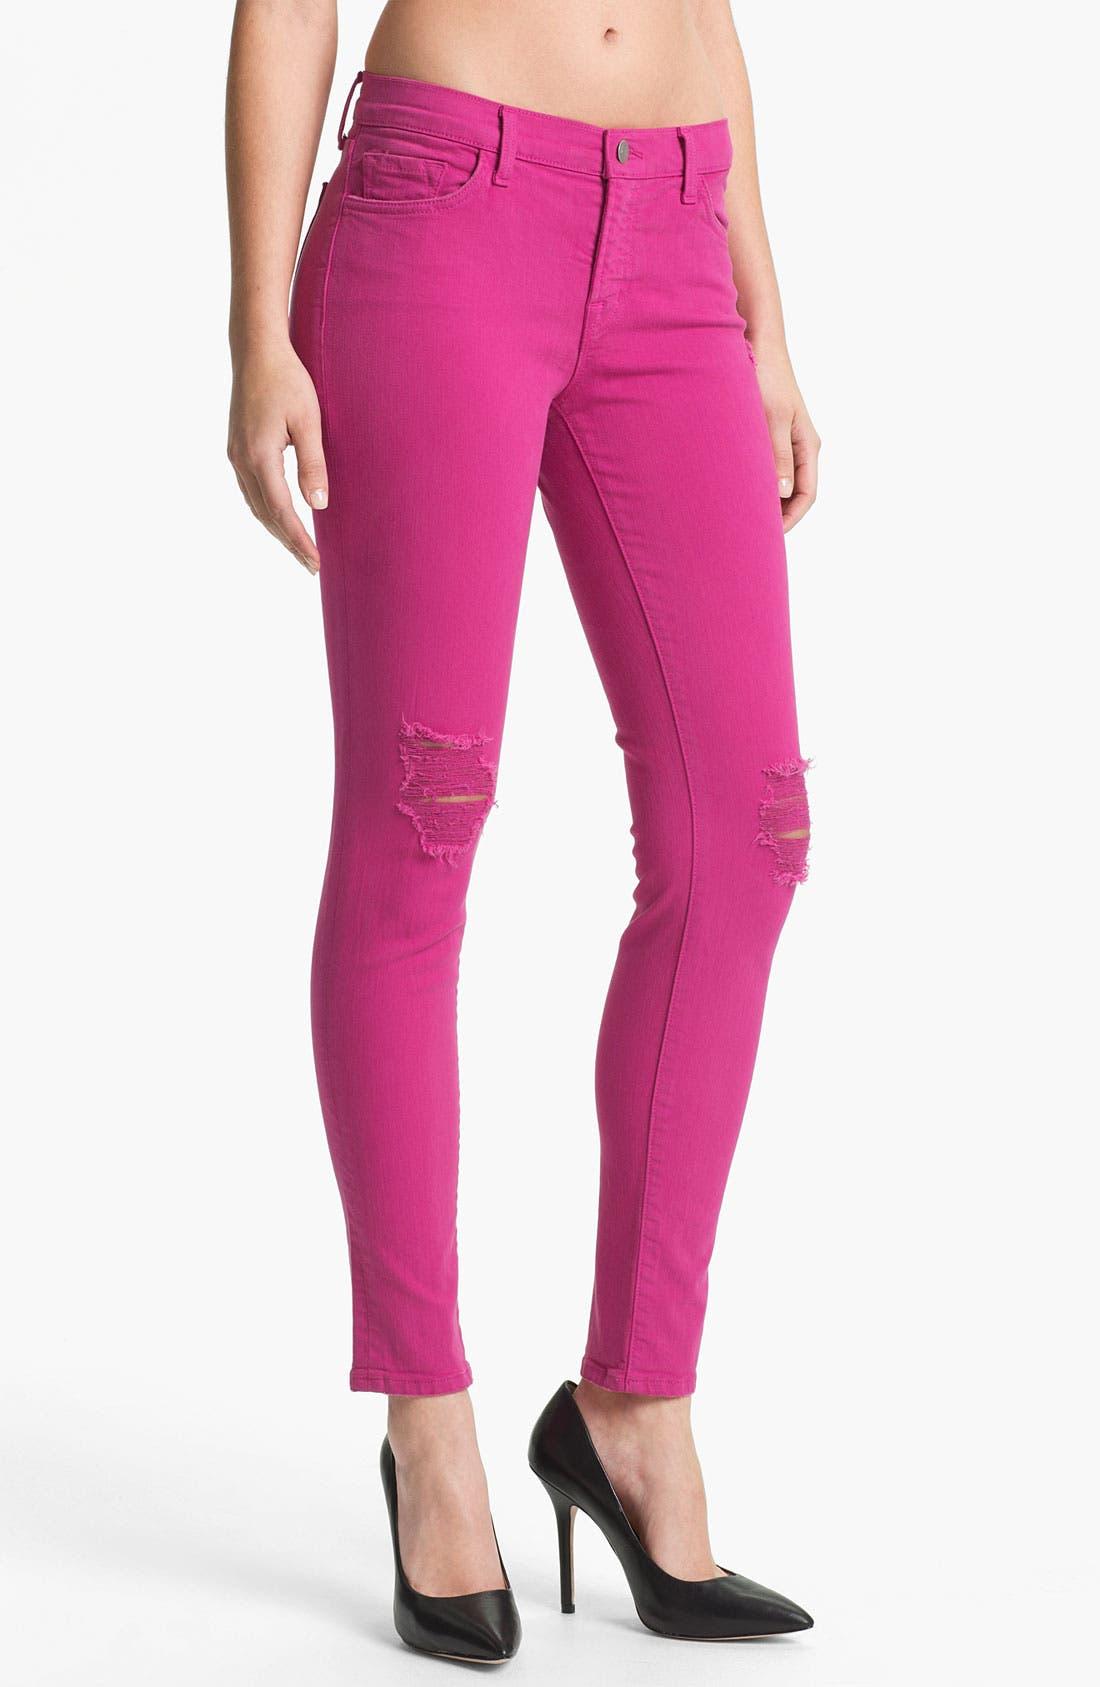 Alternate Image 1 Selected - J Brand Distressed Skinny Leg Jeans (Magenta)